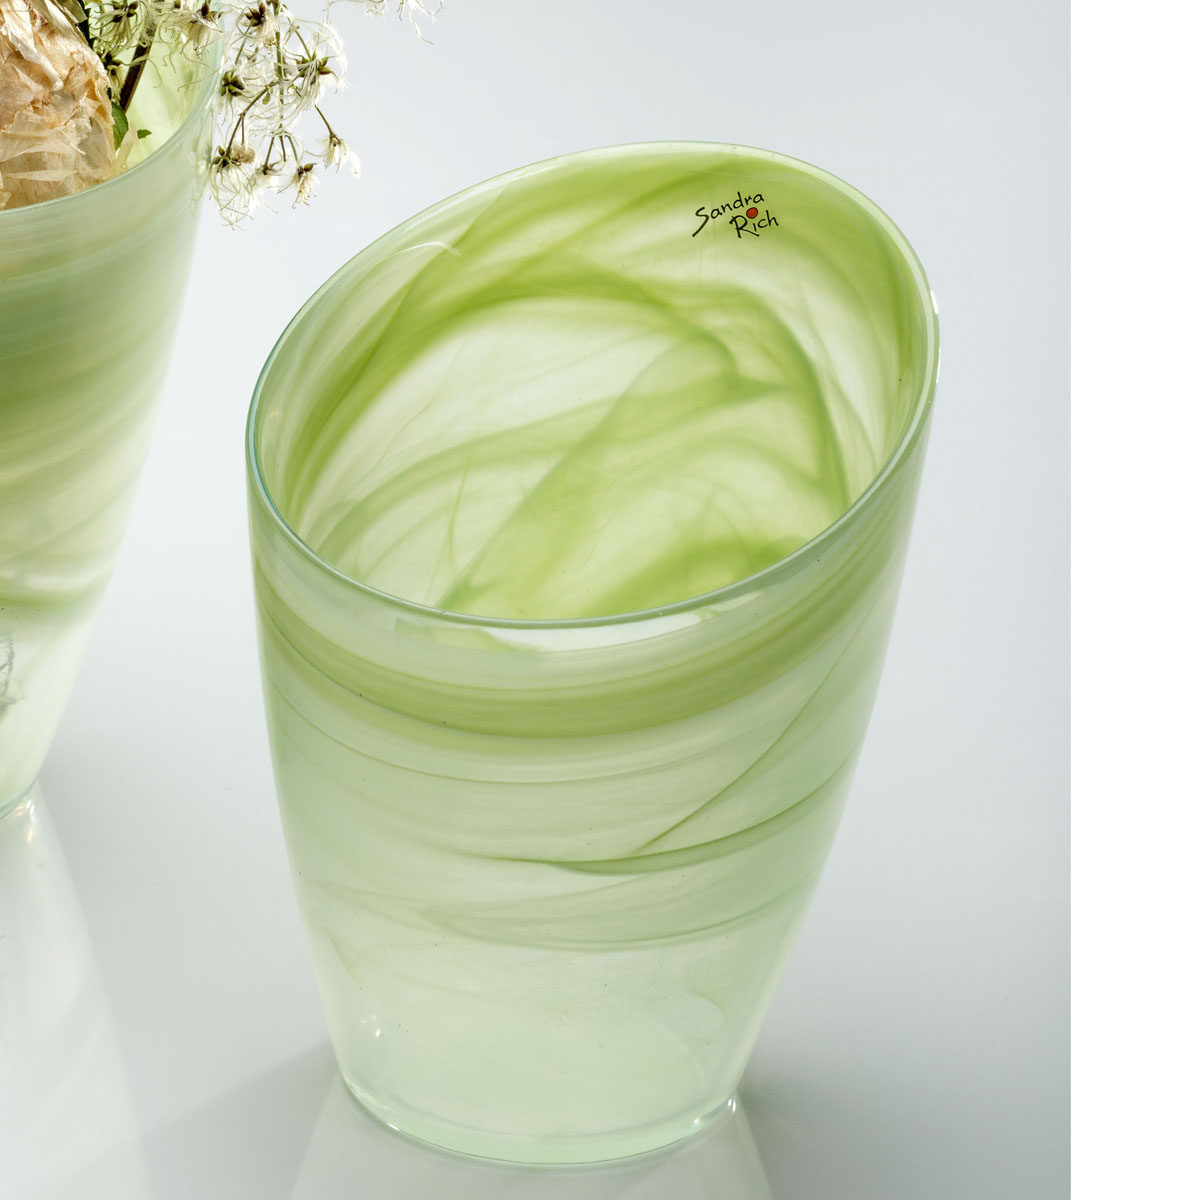 Vase glasvase blumentopf alabaster glas gr n 18x15cm for Blumentopf glas